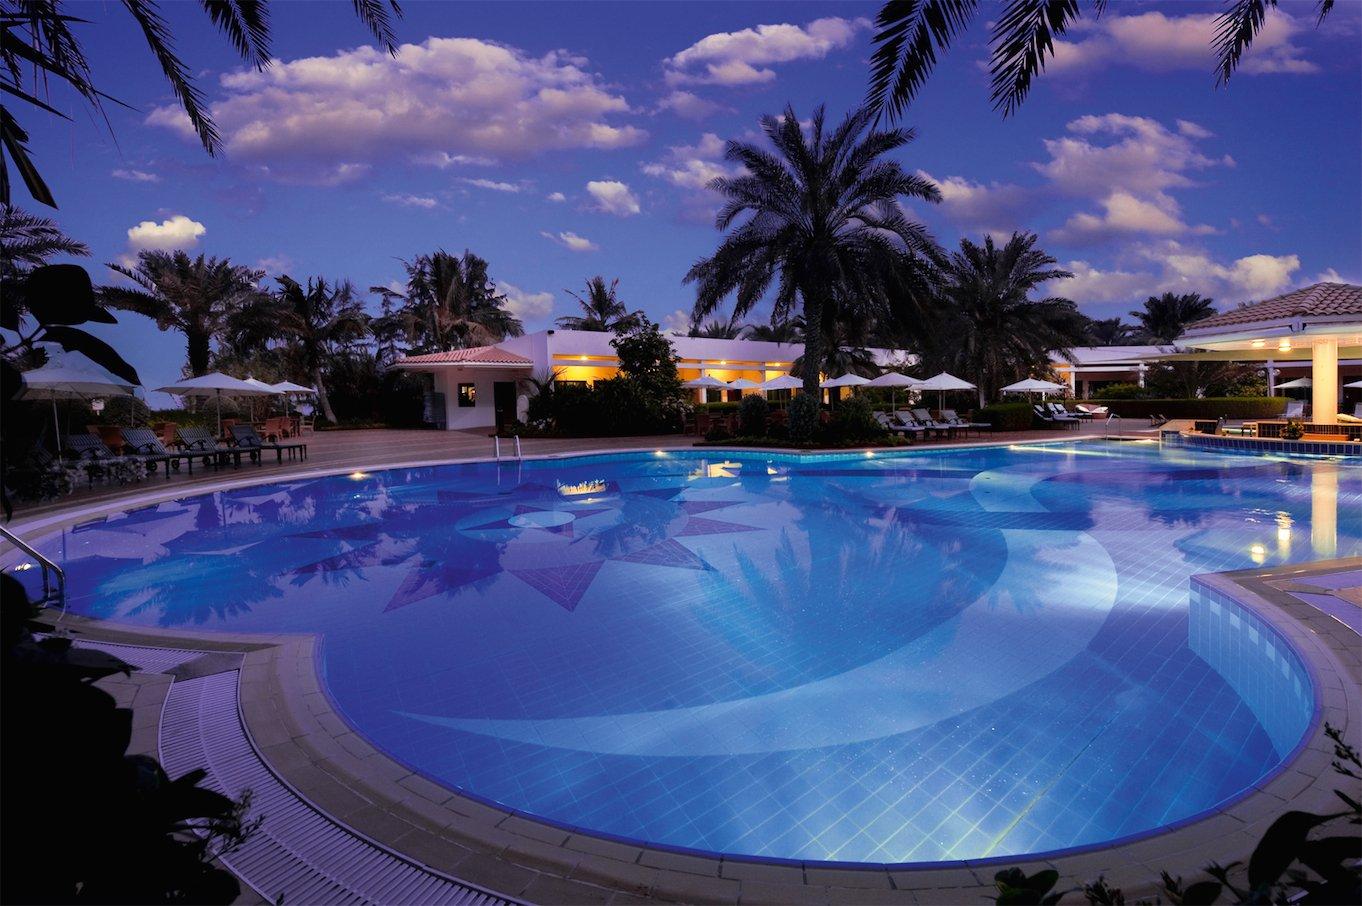 Kempinski-Hotel-Ajman-Pool_2356_Print